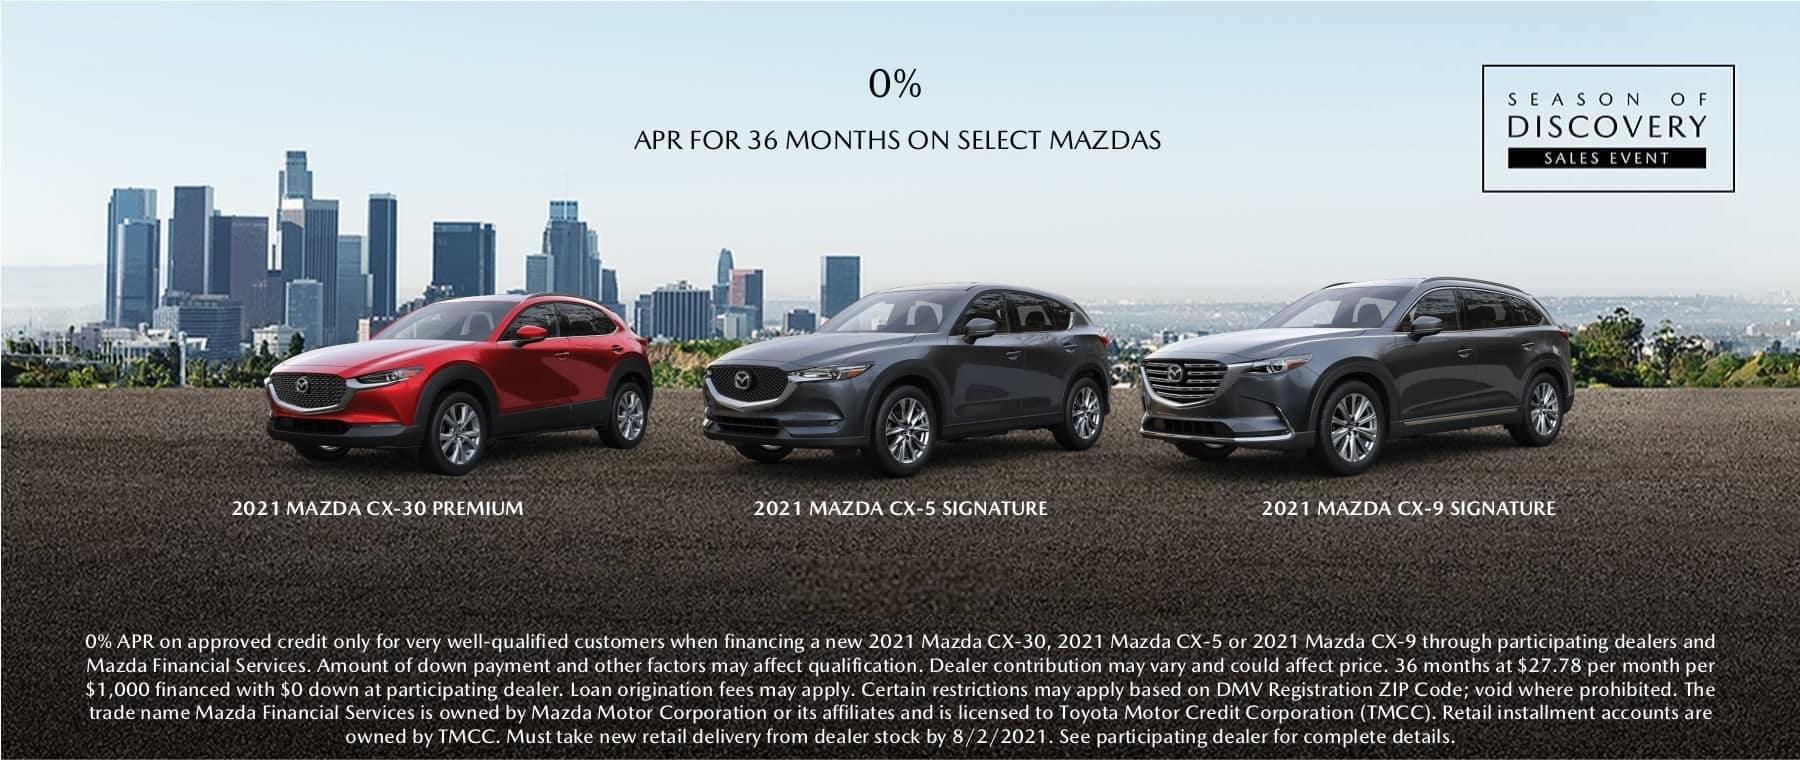 Mazda-Season-of-Discovery-1800×760100